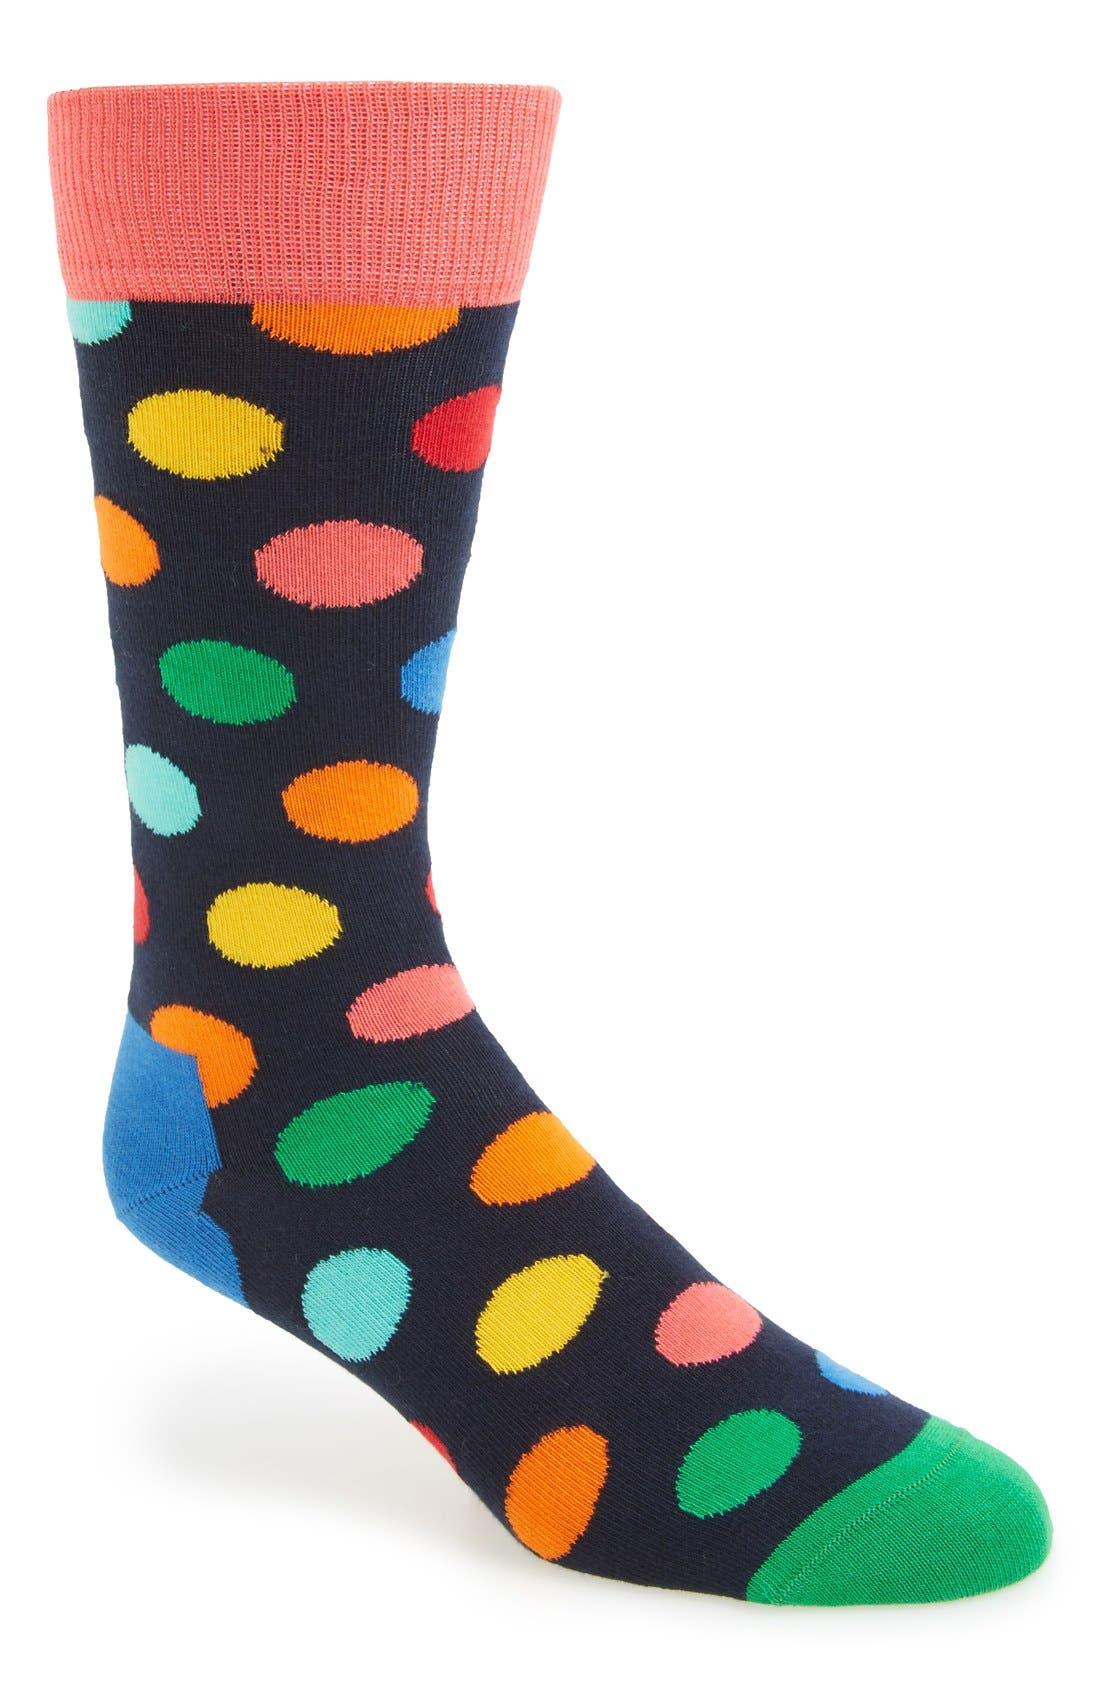 Polka Dot Cotton Blend Socks,                             Main thumbnail 1, color,                             Blue/ Bright Combo